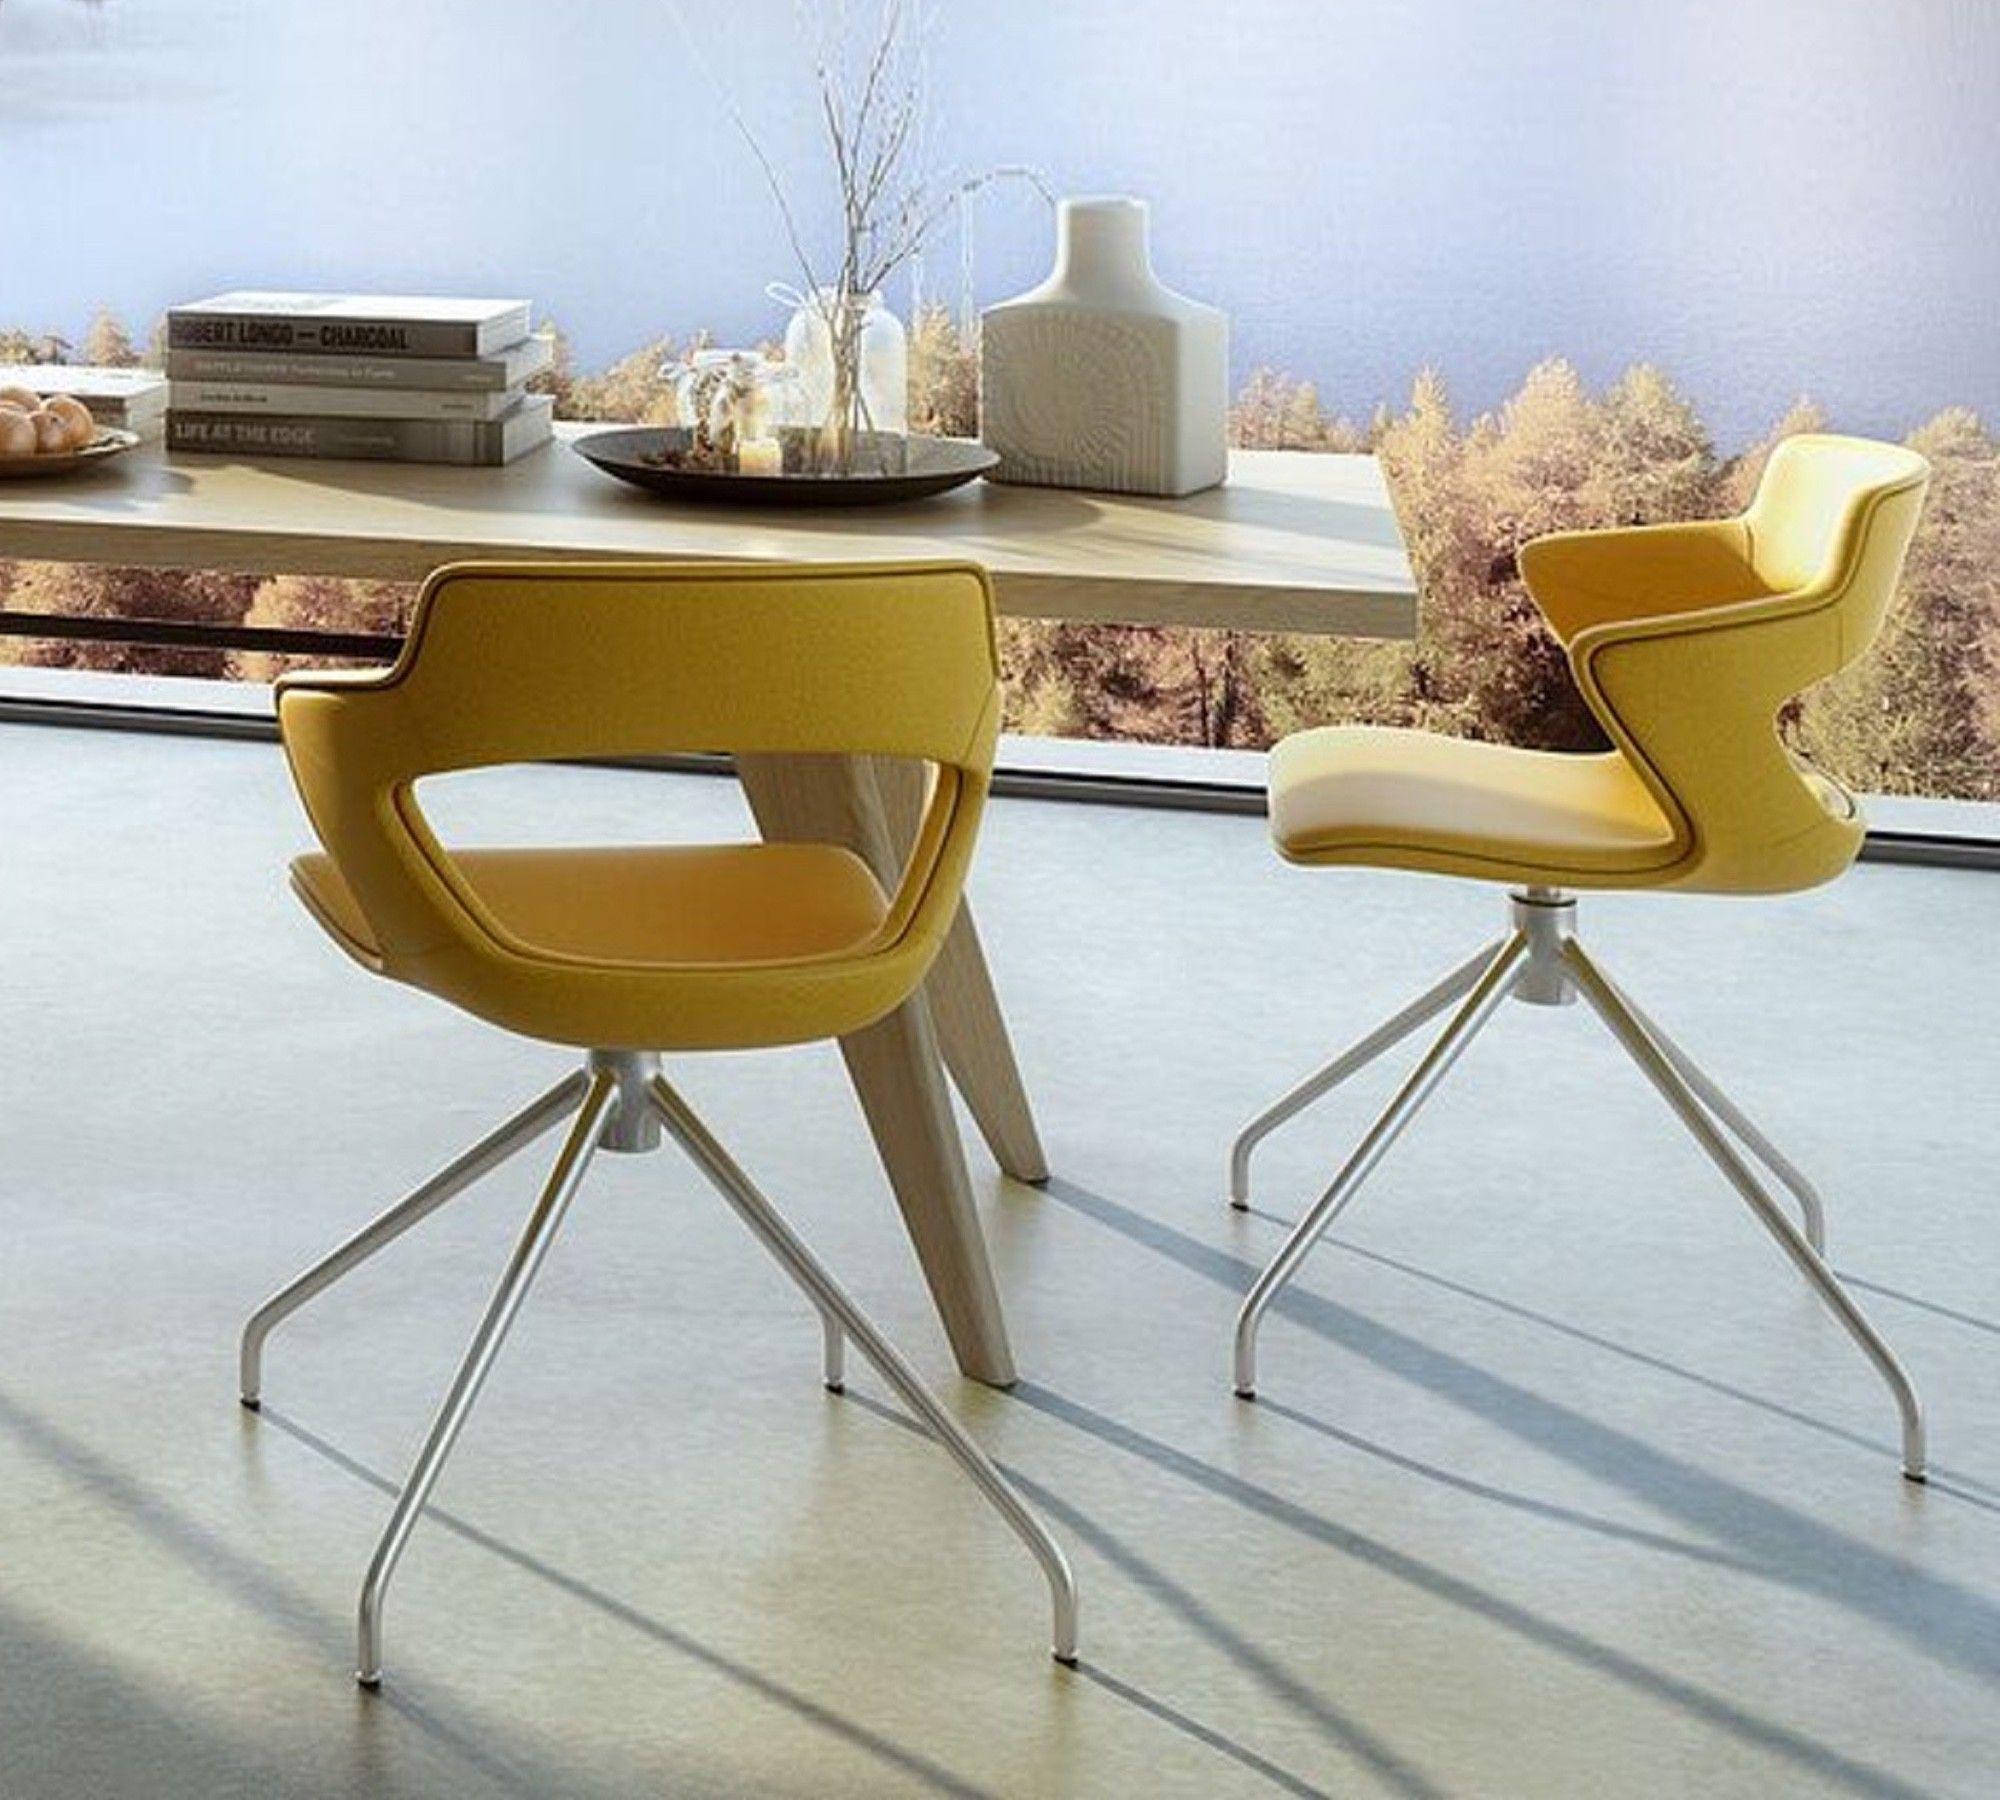 Gabler Design Drehstuhl AOKI STYLE Mit Sitzschale Gepolstert 10008170